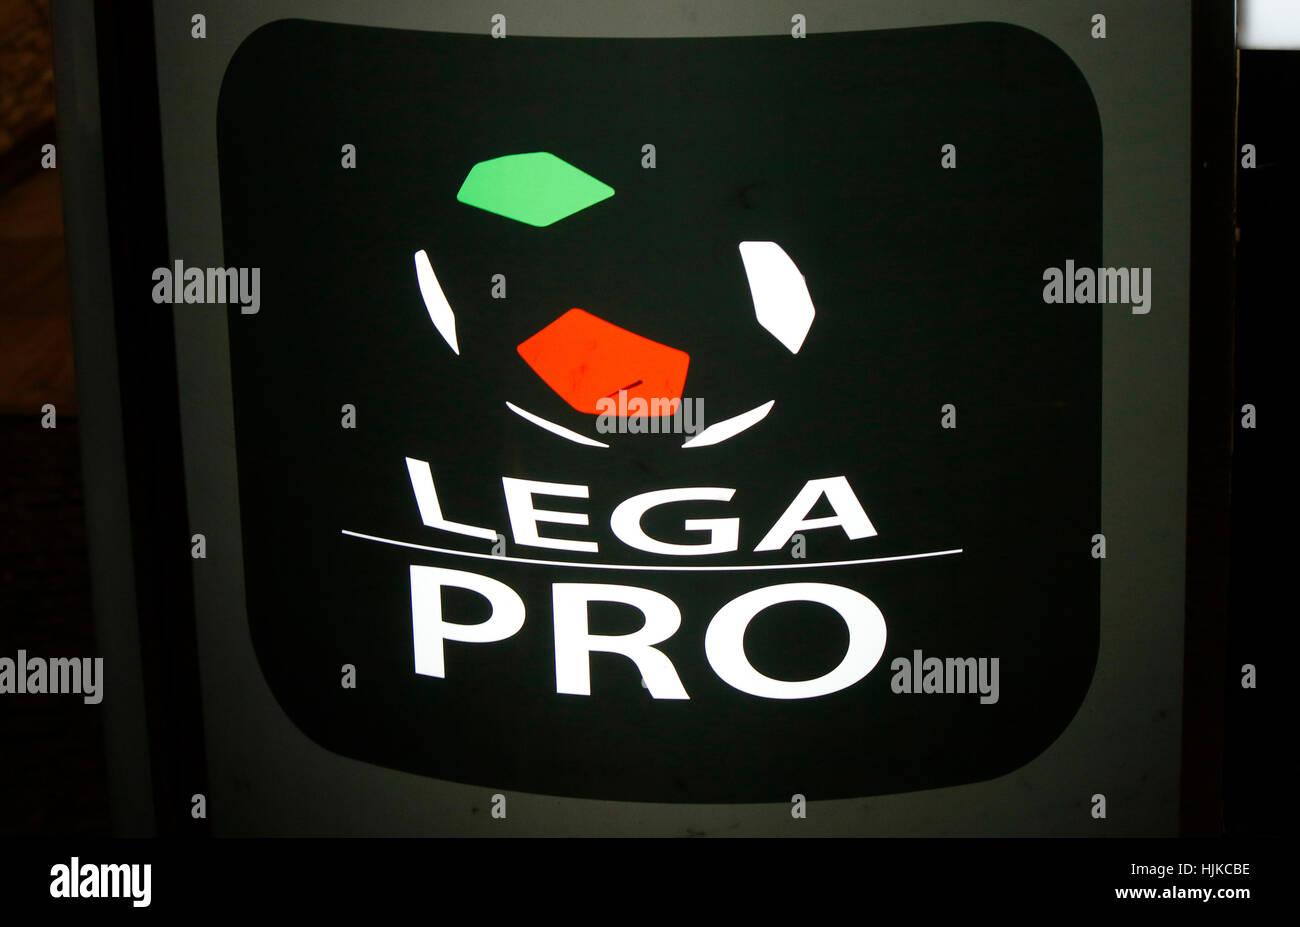 "das Logo der Marke ""Lega Pro"", Berlin. Stock Photo"